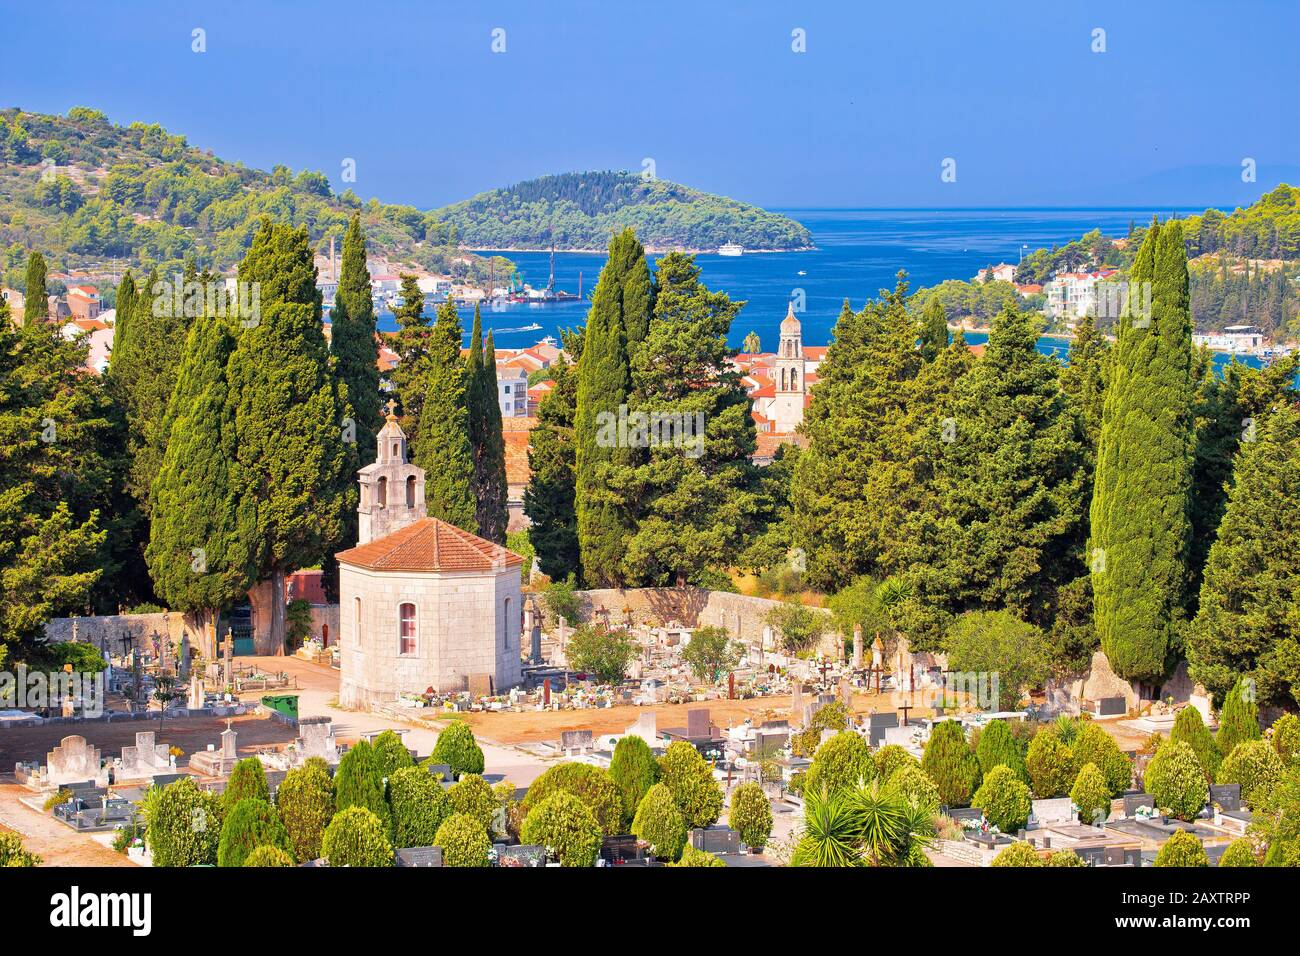 Vela Luka on Korcula island bay and cemetery view, archipelago of southern Dalmatia, Croatia Stock Photo